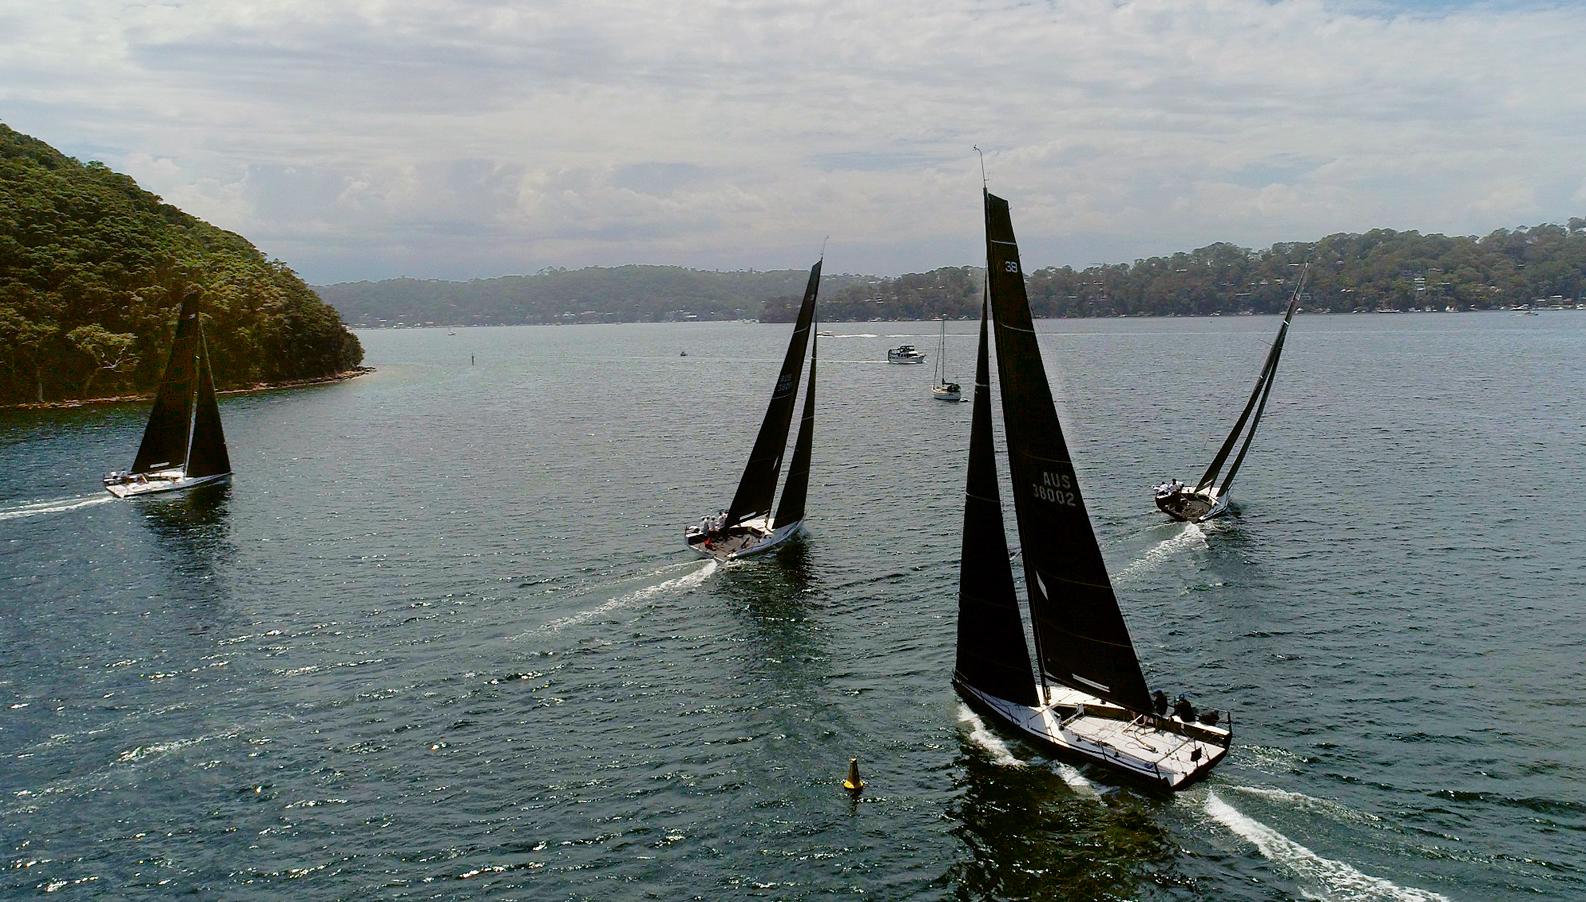 MC38 Fleet at the Australian Championship 2017. Photo Bob Fowler.